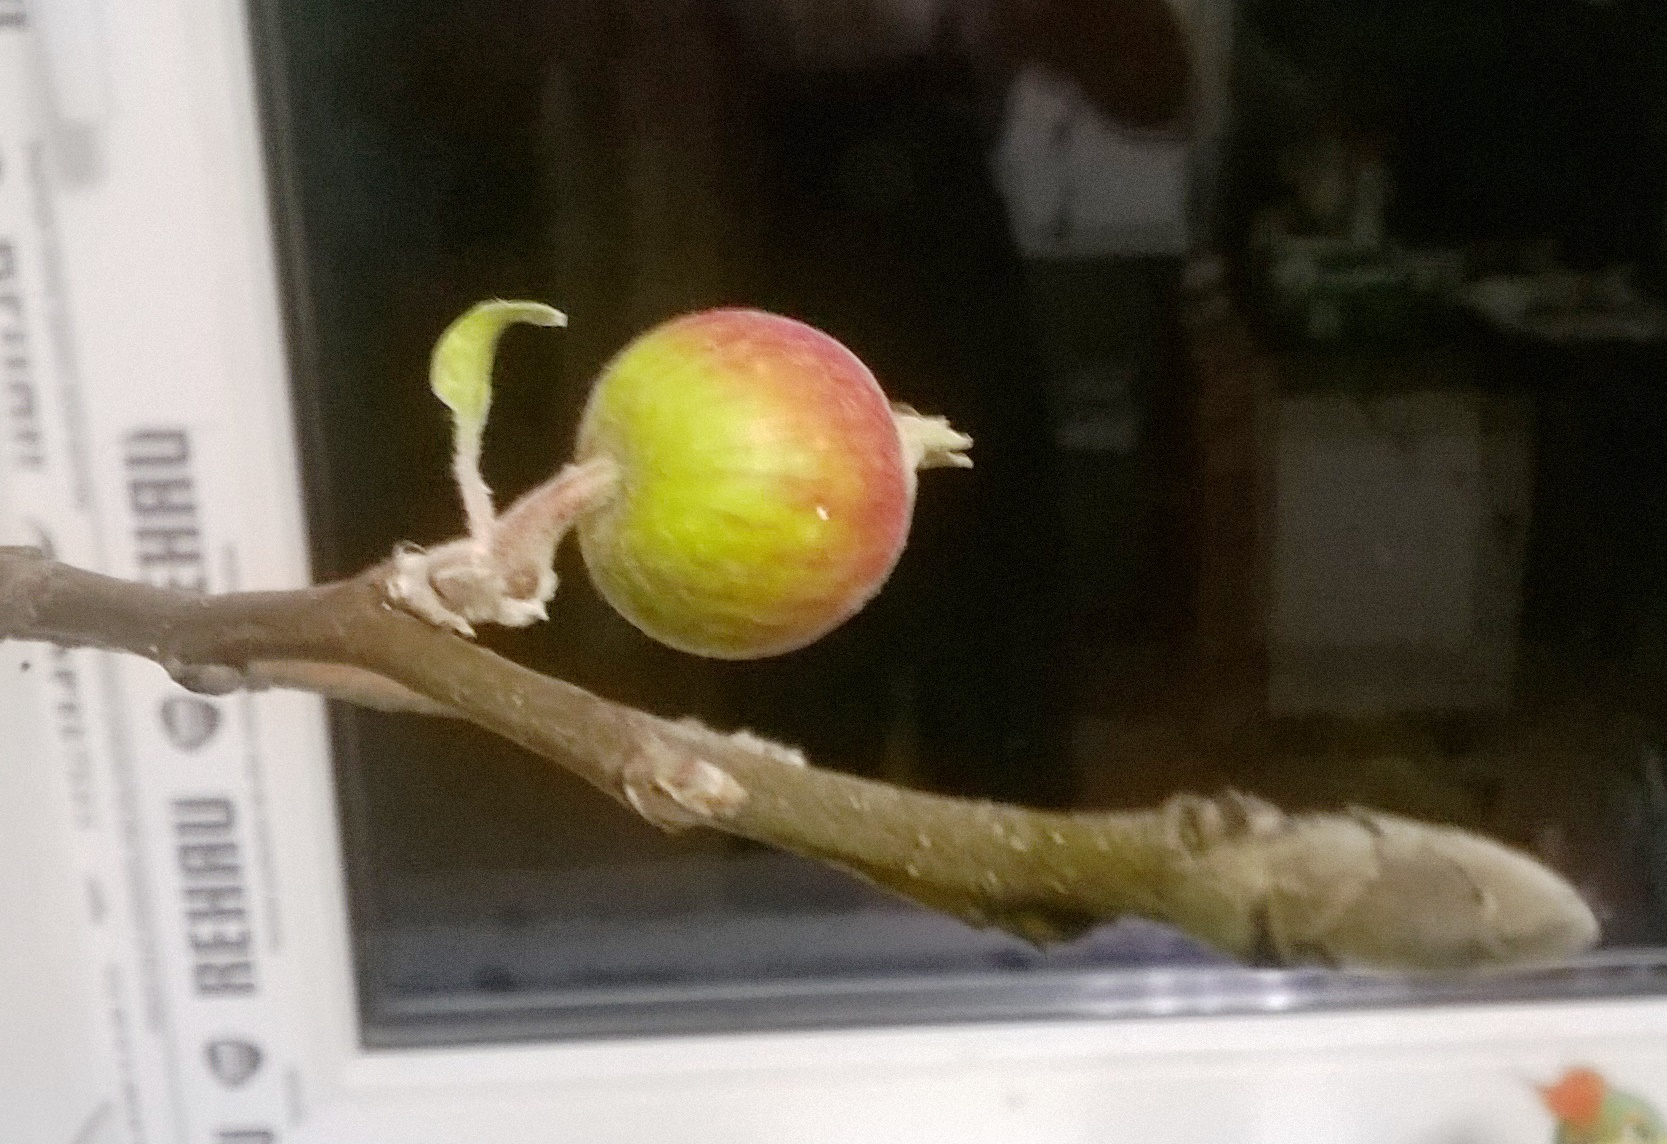 фото цветочной почки яблони признан сумасшедшим